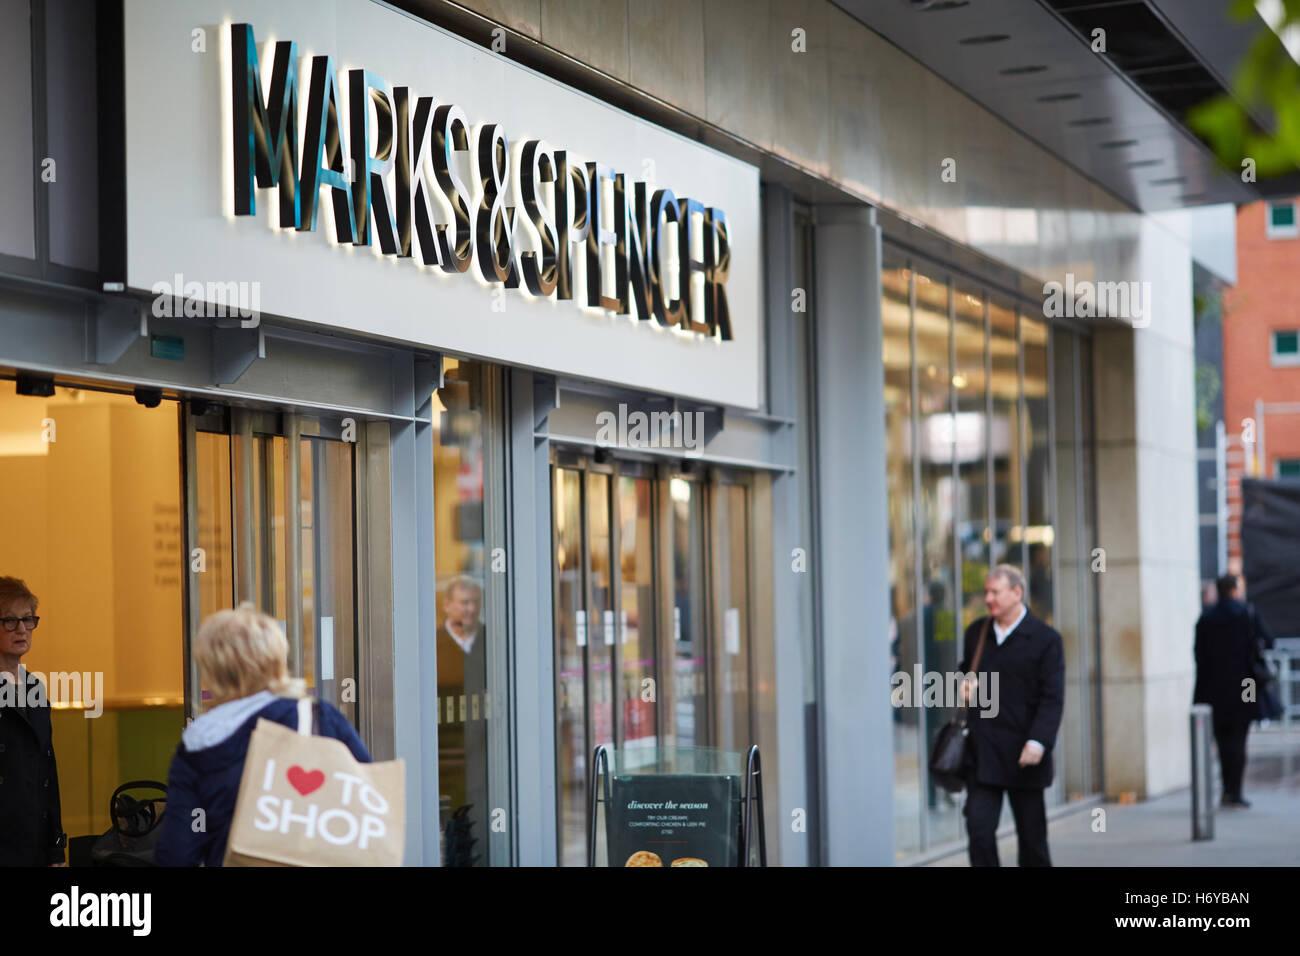 Manchester Marks and Spenser shop exterior   M&S entrance Market Street Shops shopping shopper store retail - Stock Image